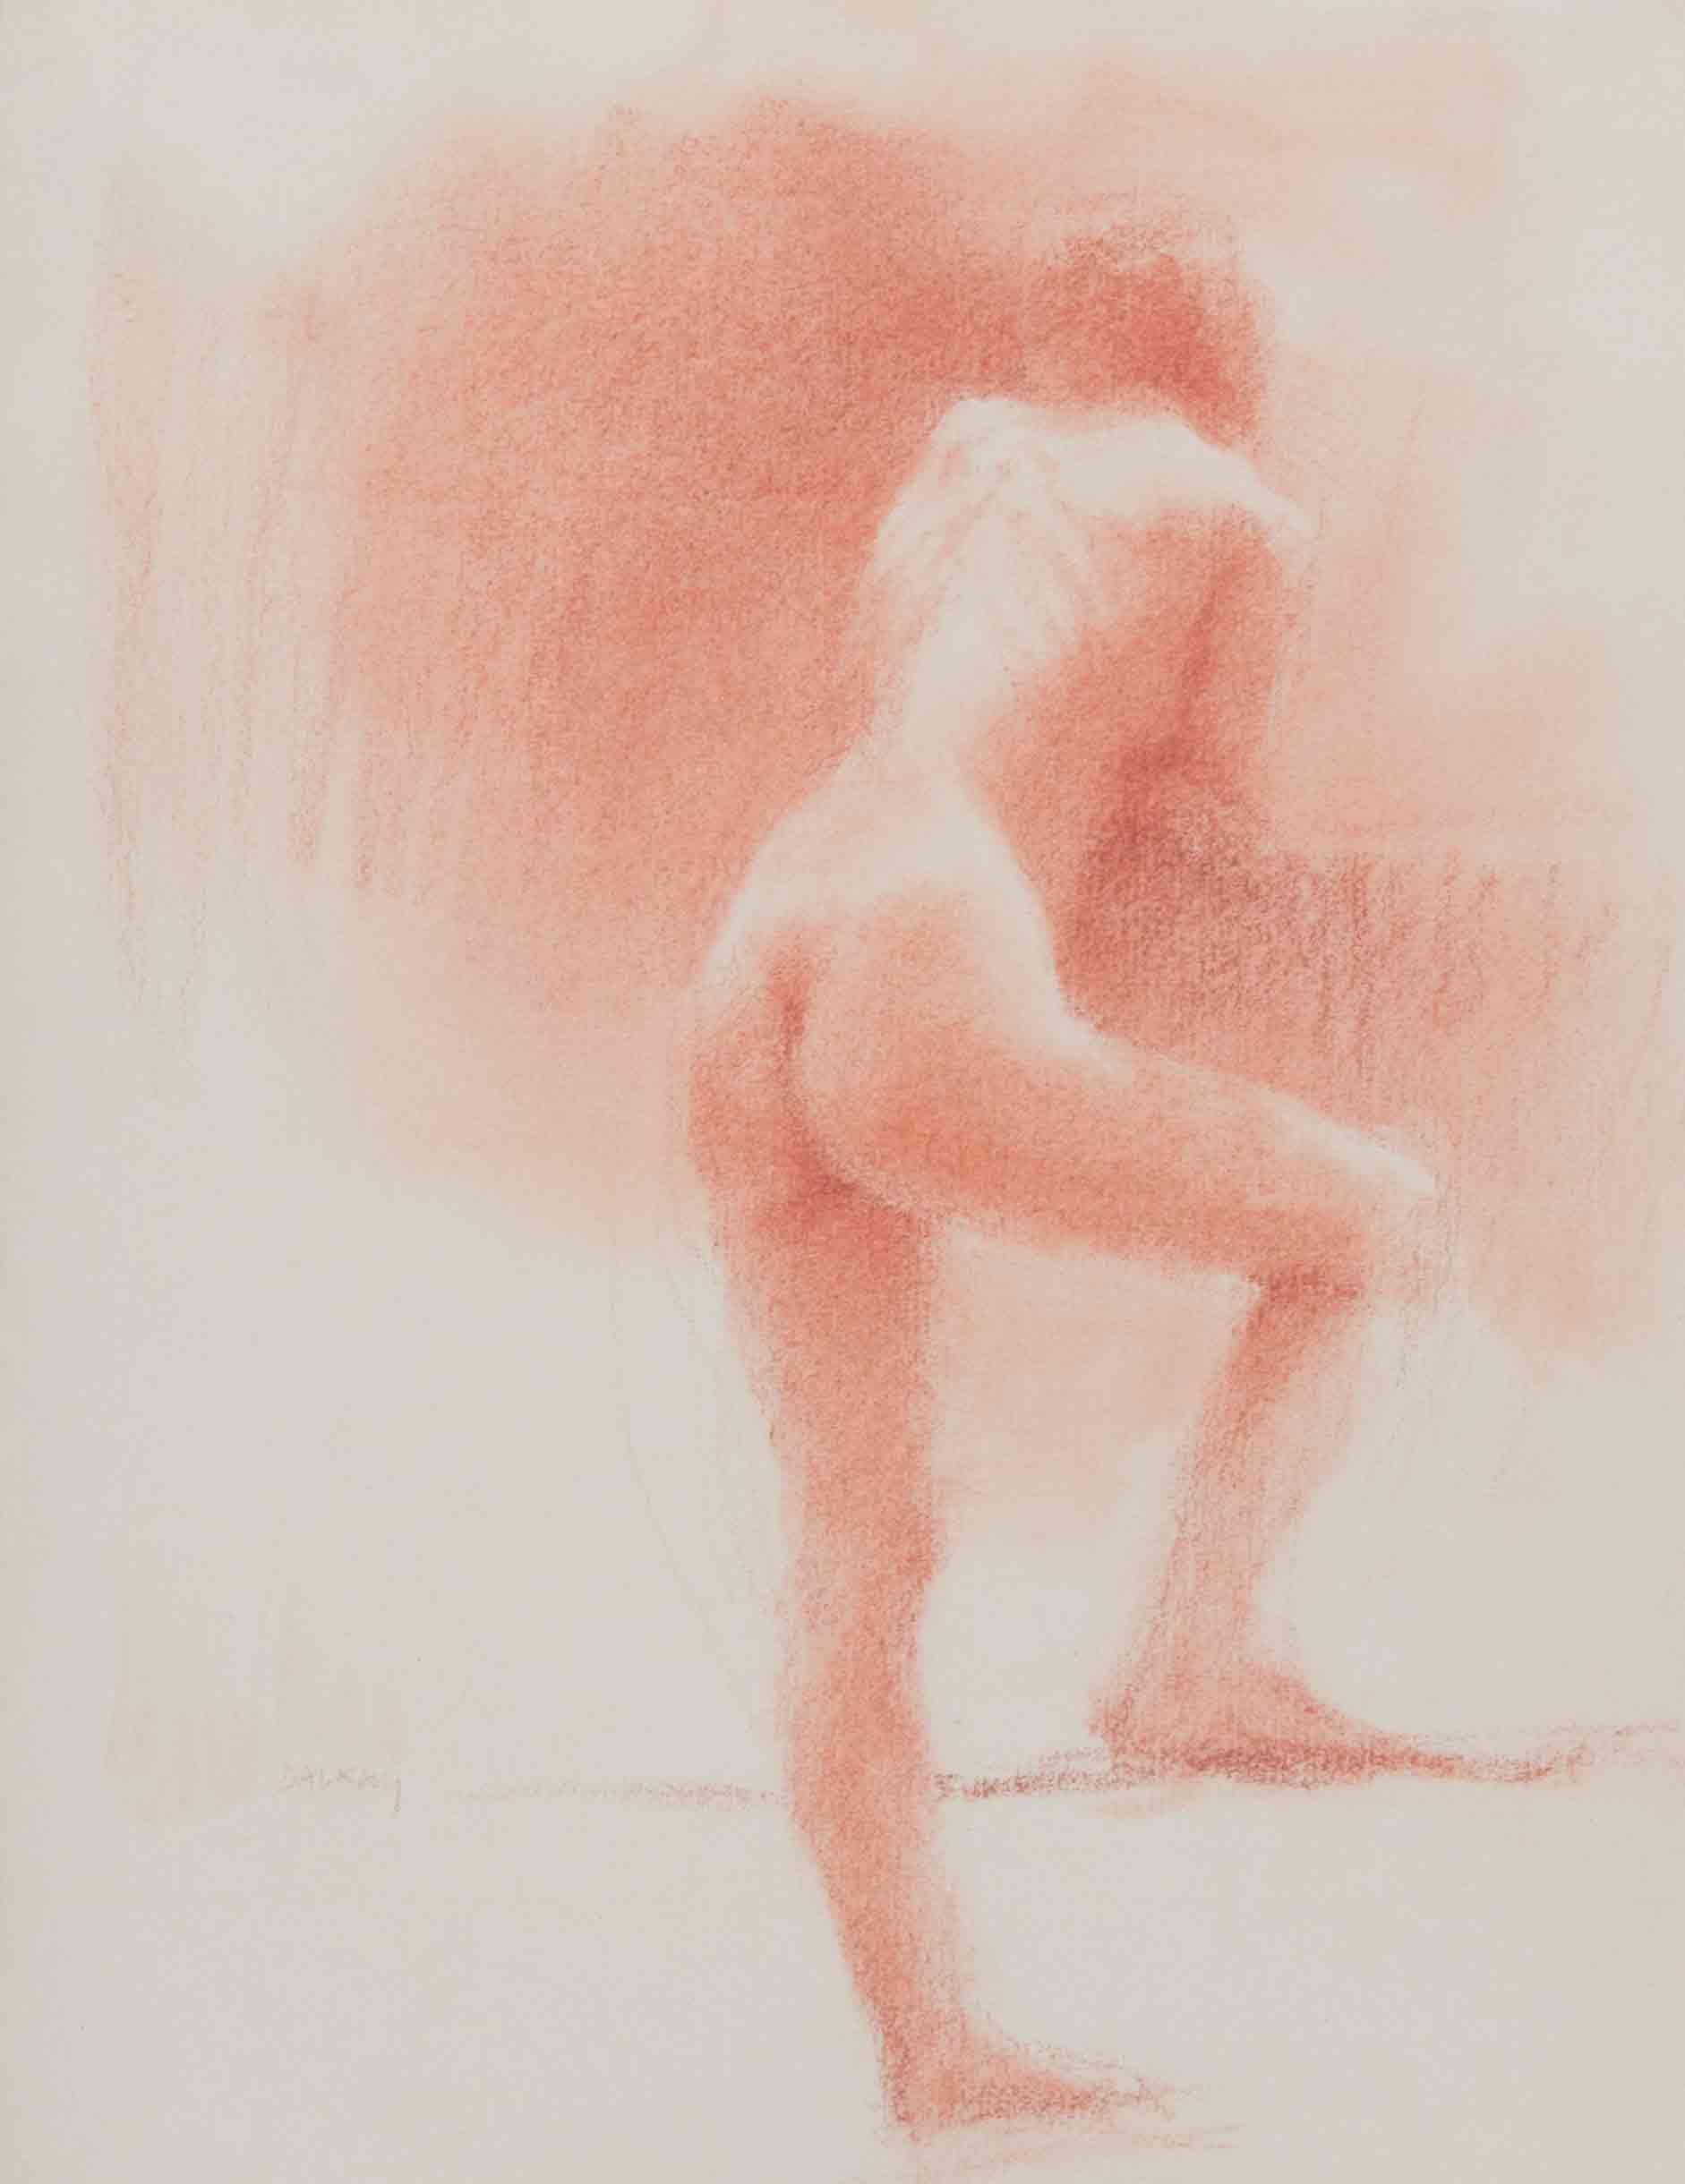 Fred Dalkey, Untitled, c. 1985